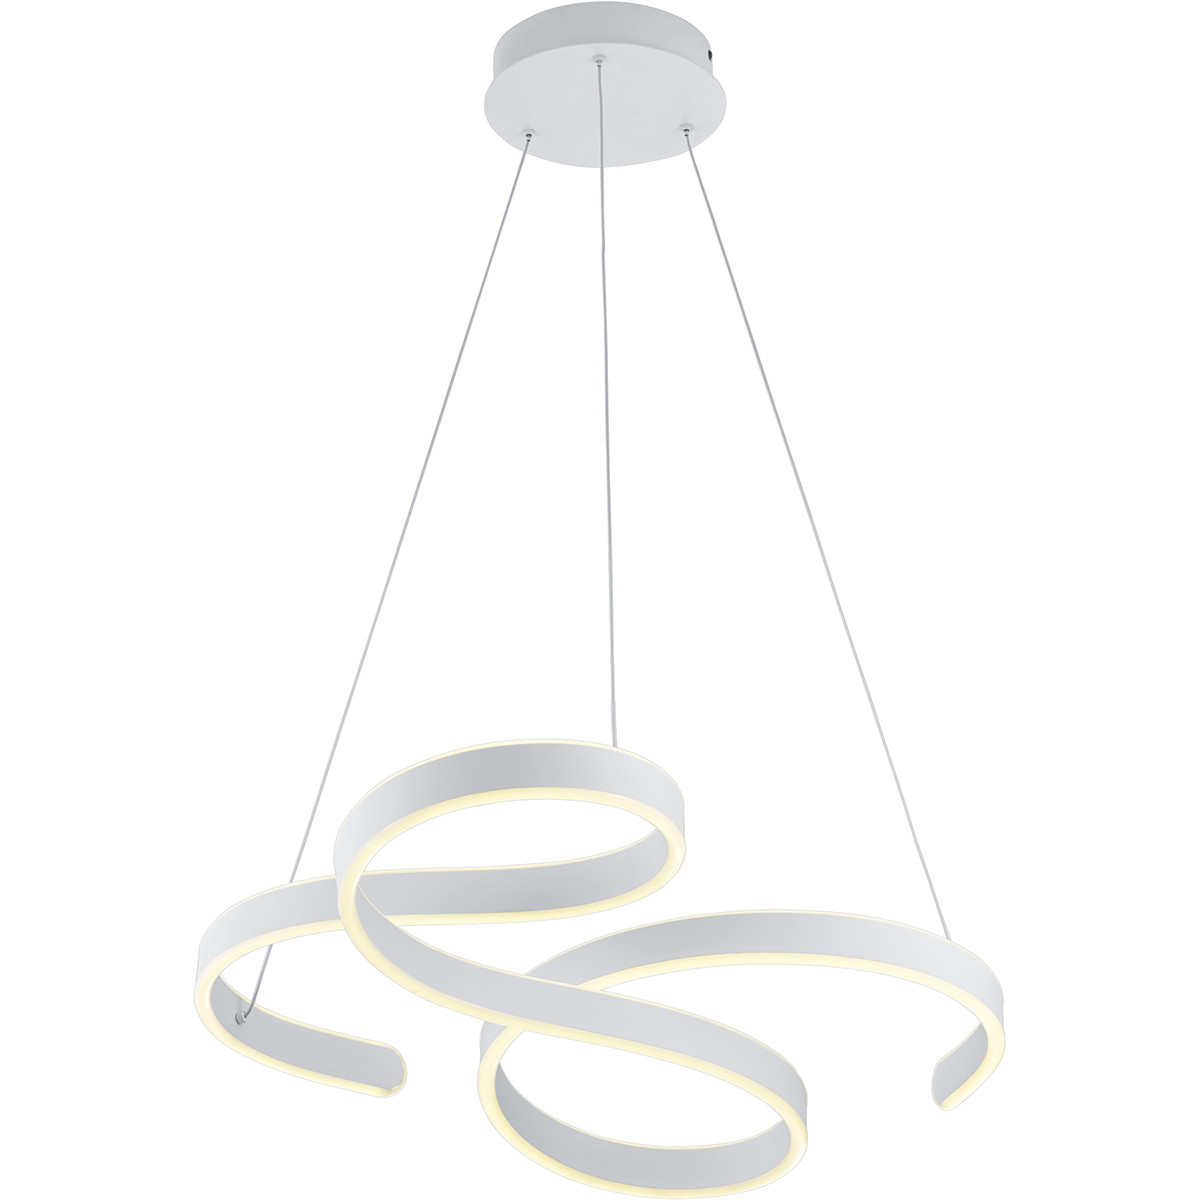 LED Hanglamp - Hangverlichting - Trion Frinco - 52W - Warm Wit 3000K - Dimbaar - Rond - Mat Wit - Al